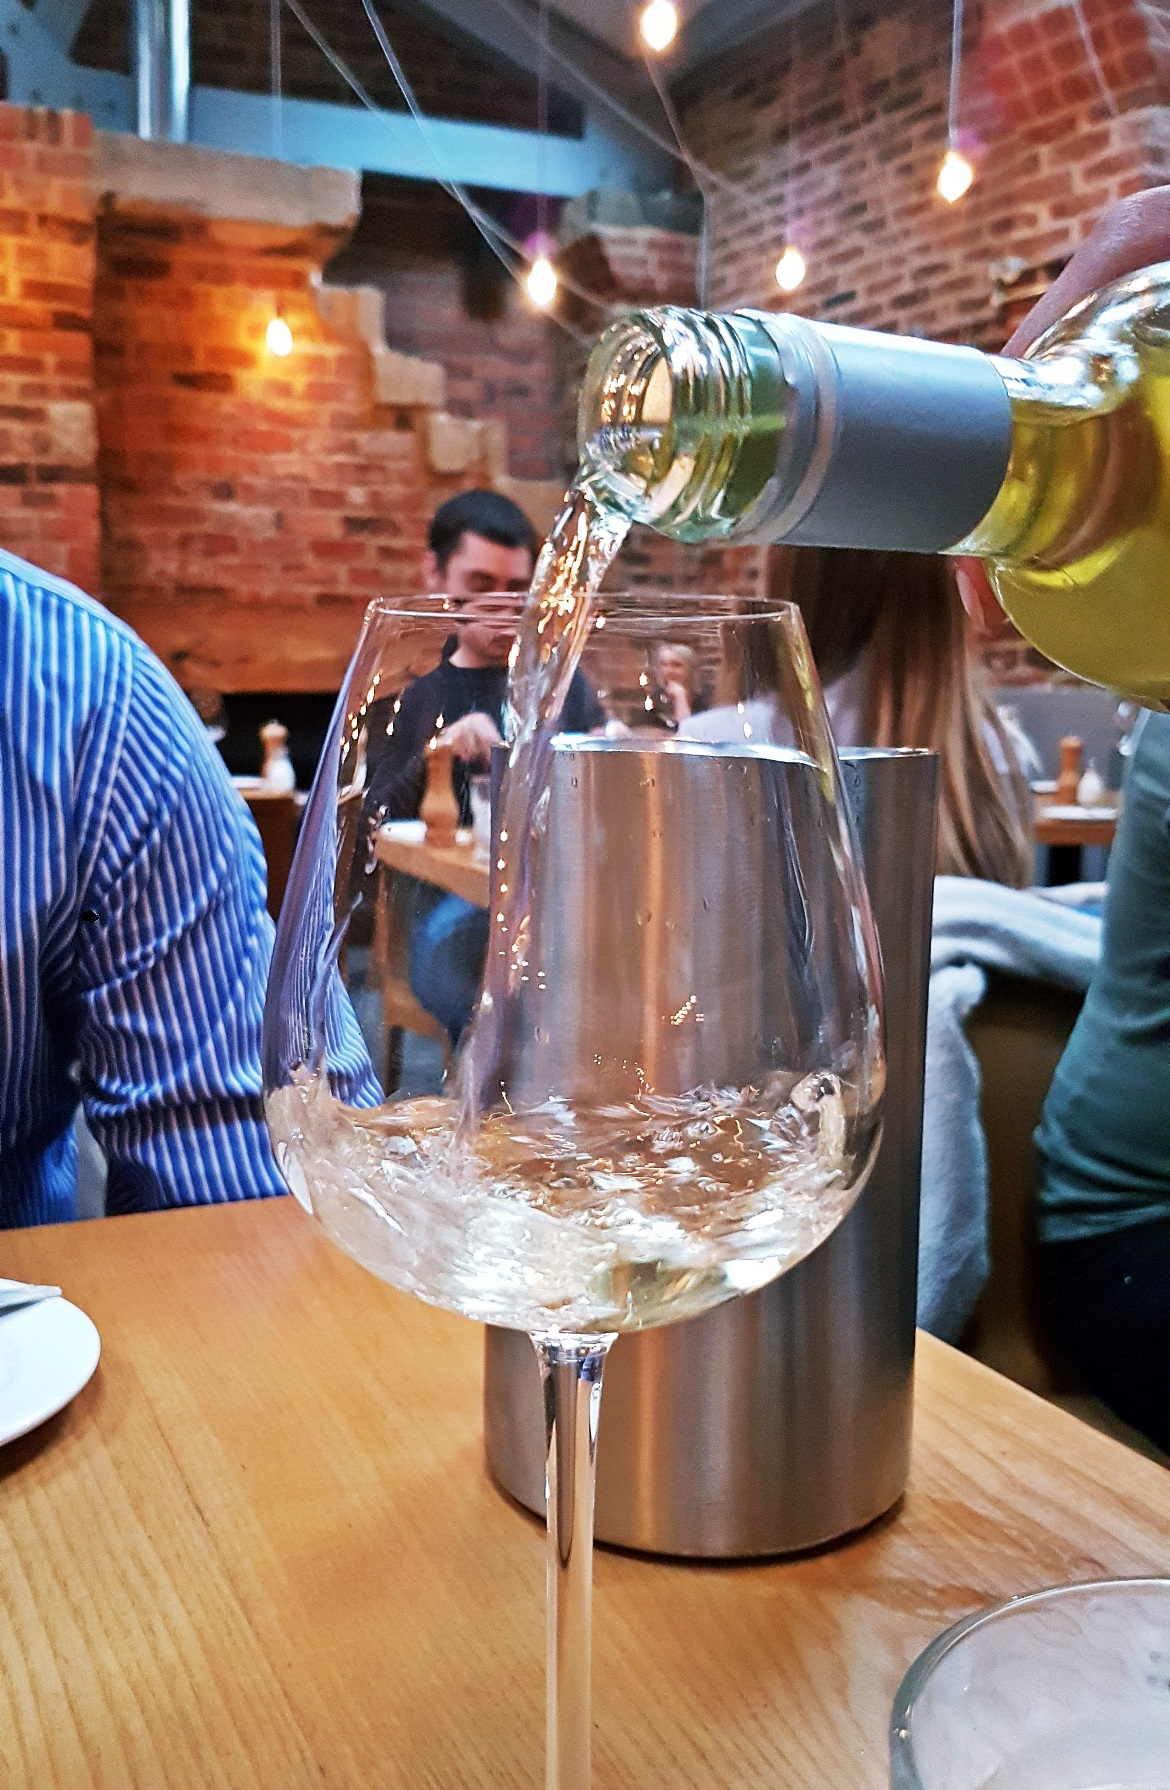 Verdejo wine - Restaurant Review of Shears Yard, Leeds Restaurant Week menu by BeckyBecky Blogs